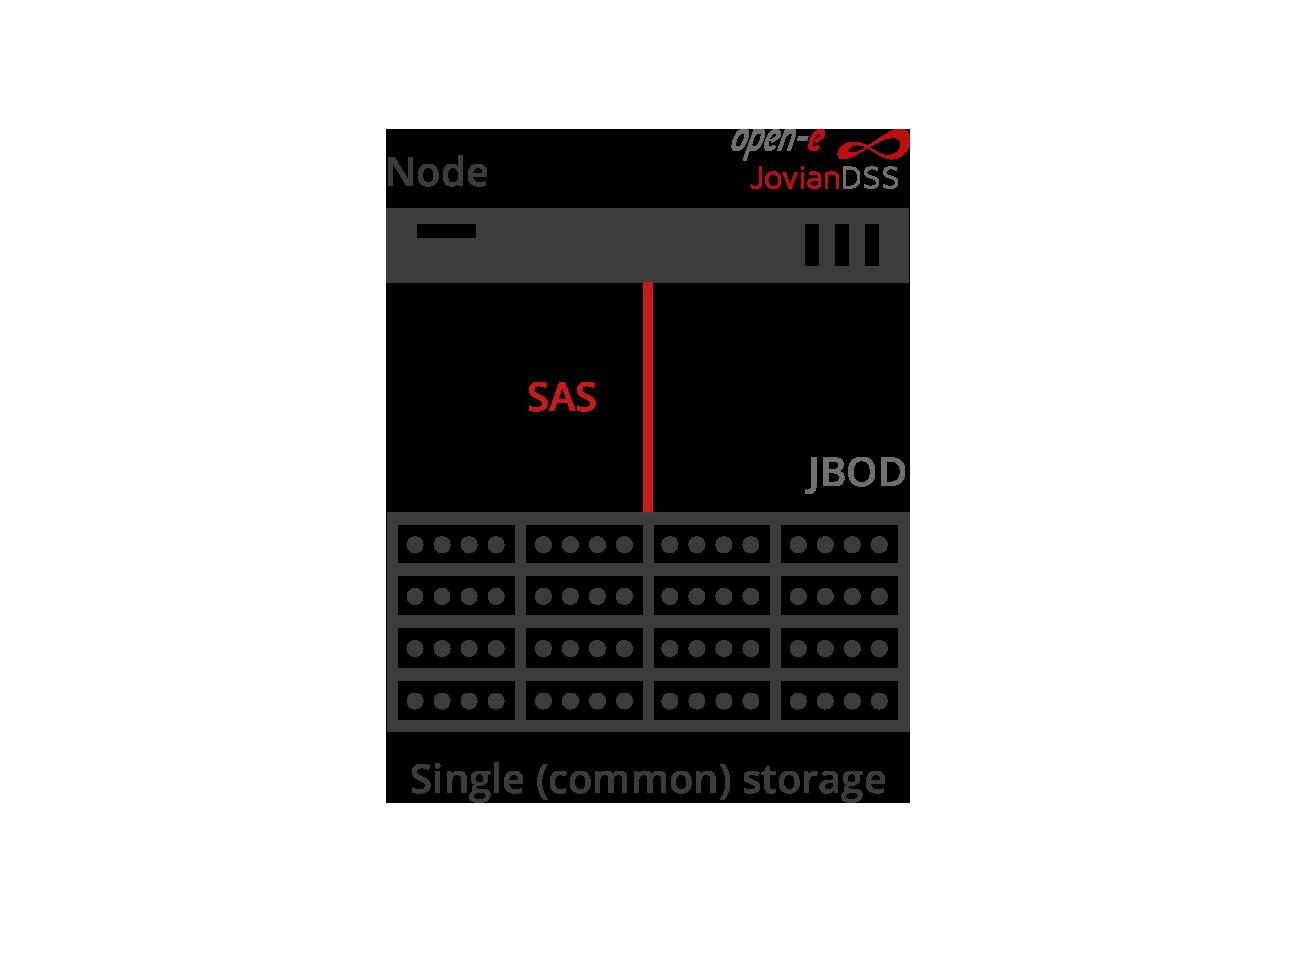 Single SAS connected storage